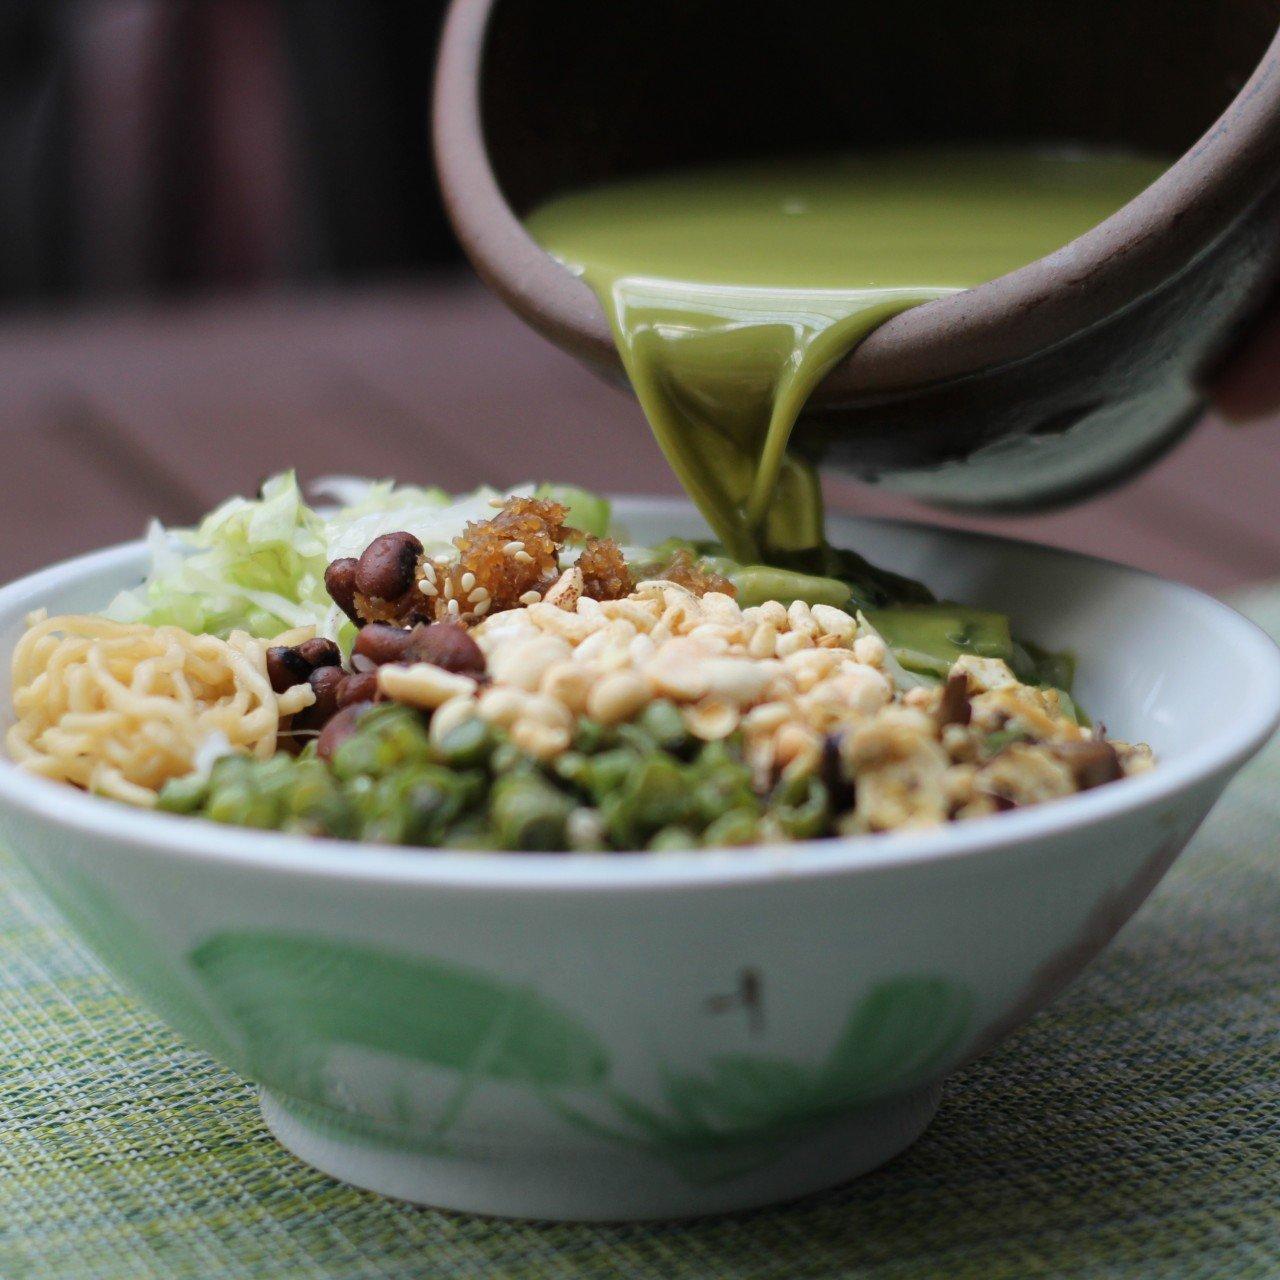 Hakka cuisine in Singapore: where to find leicha thunder tea